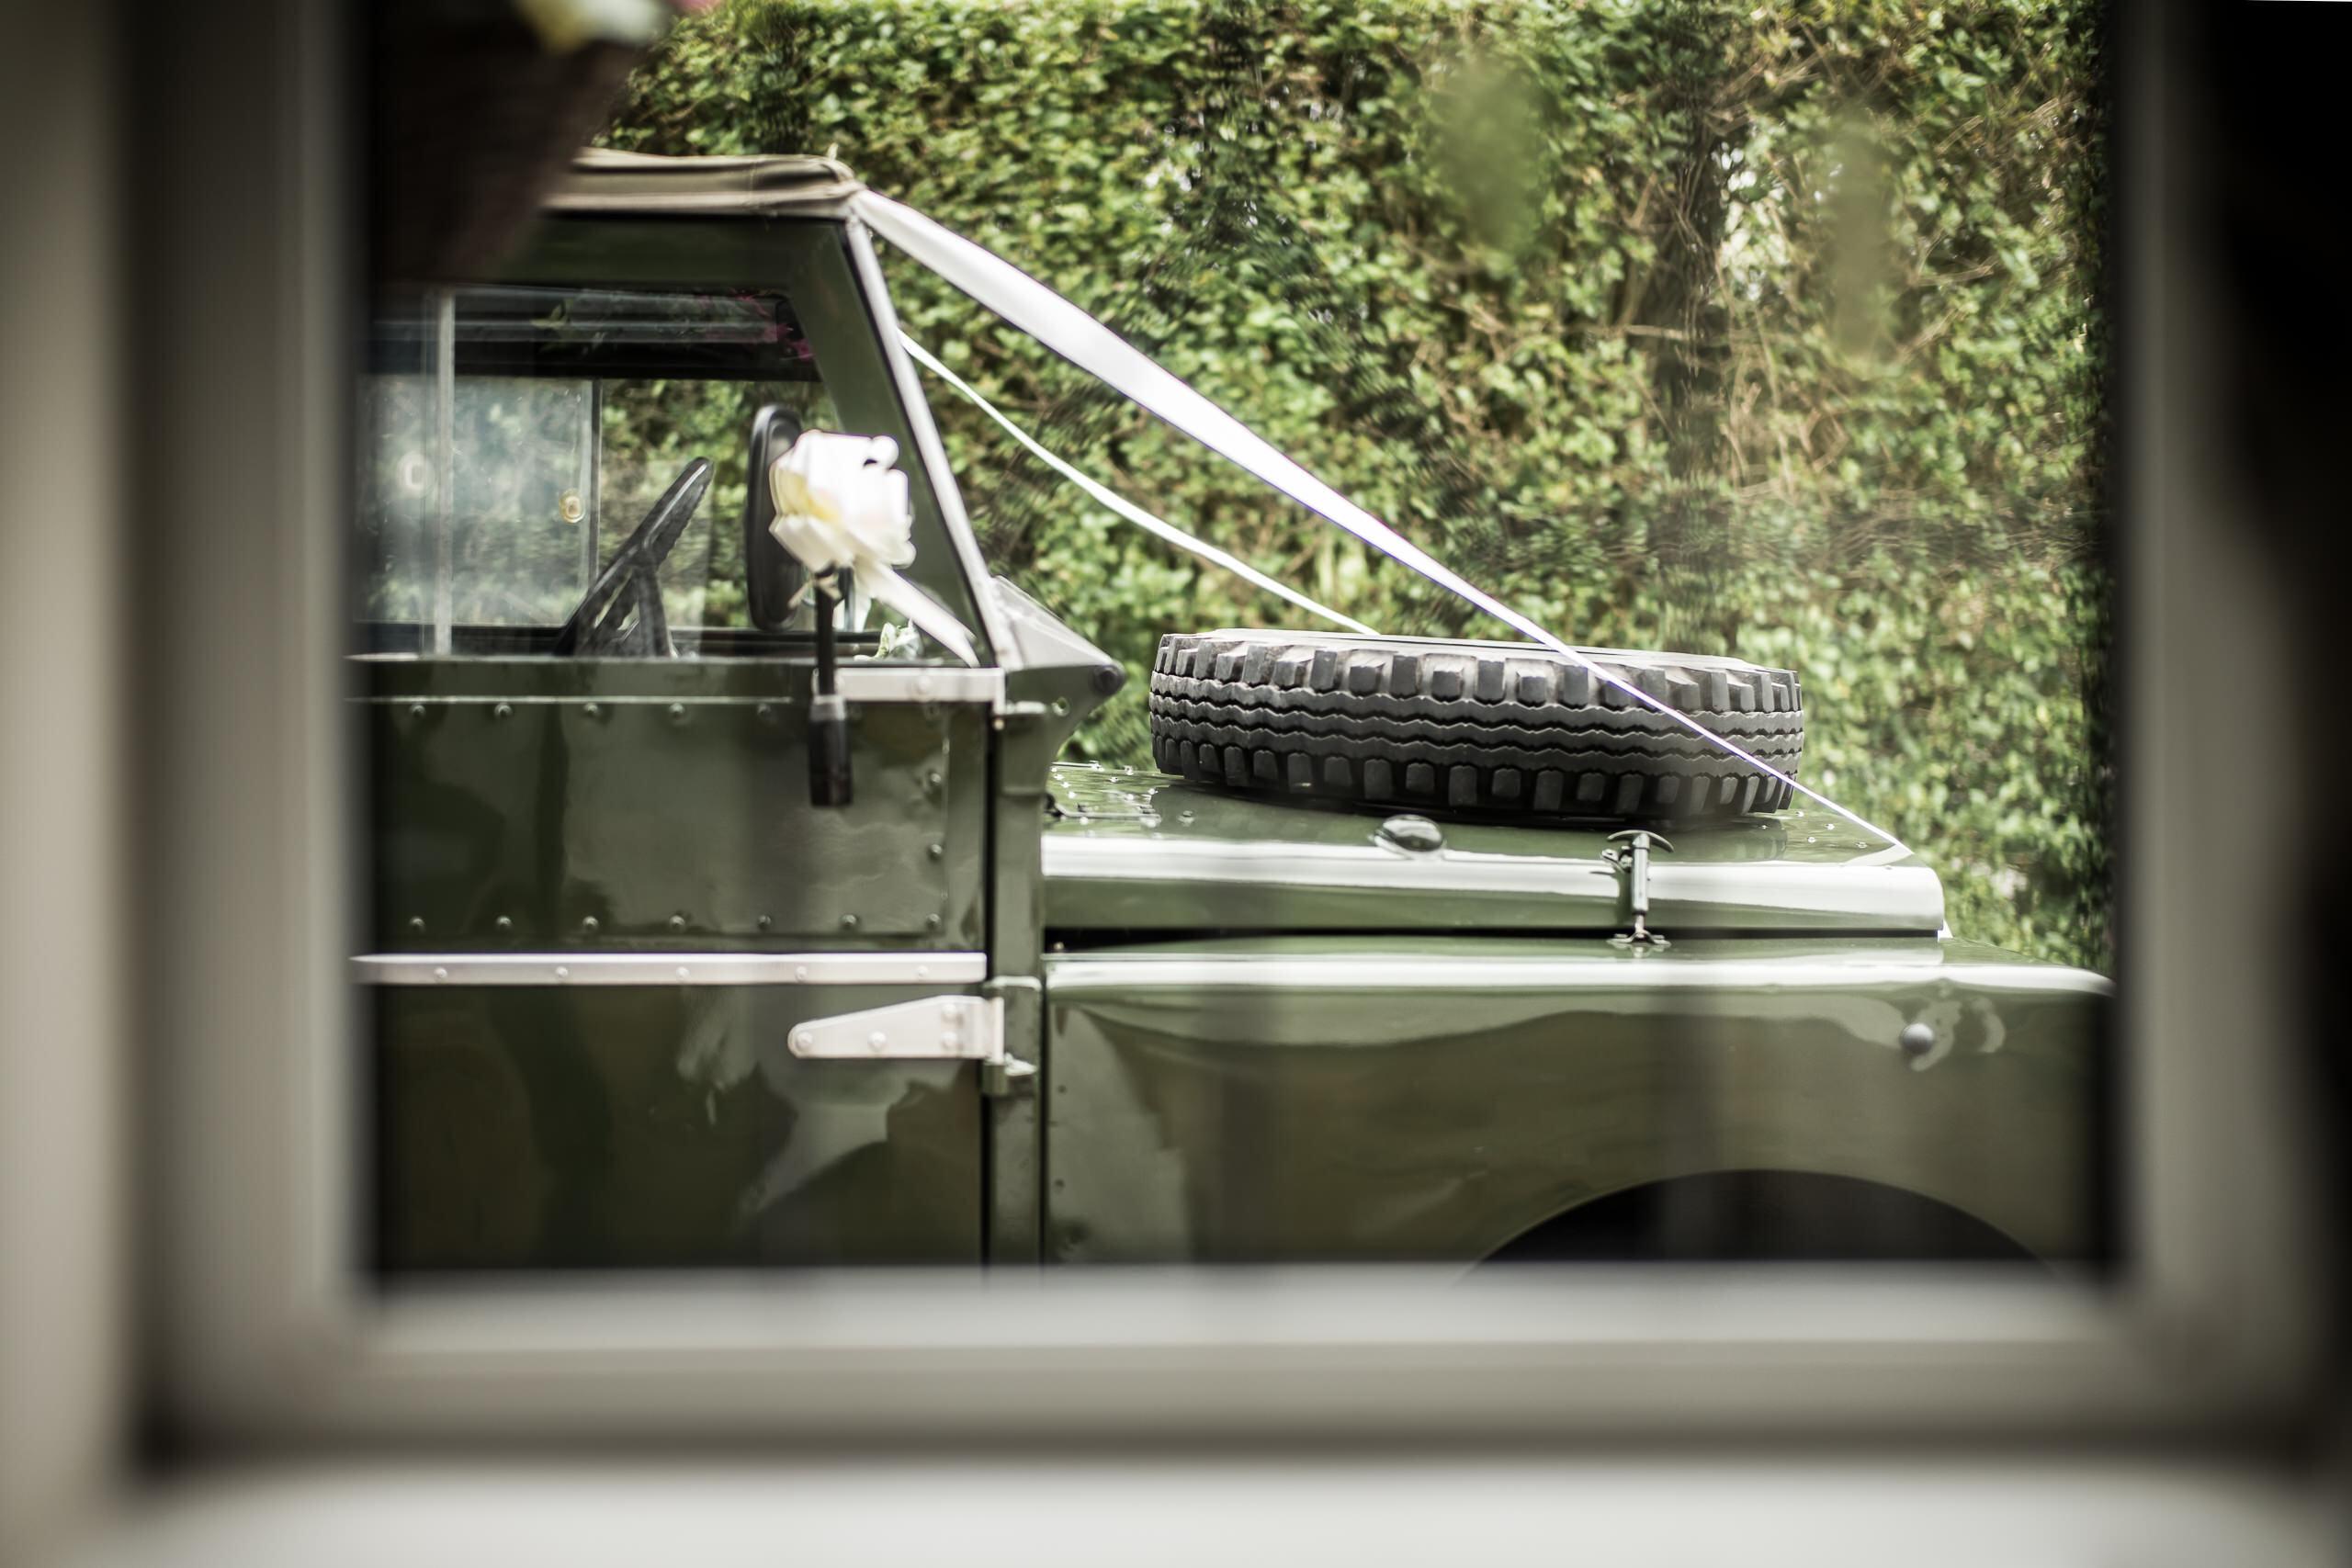 Wedding Gallery In The Village Land Rover Window By Brett Leica Photographer